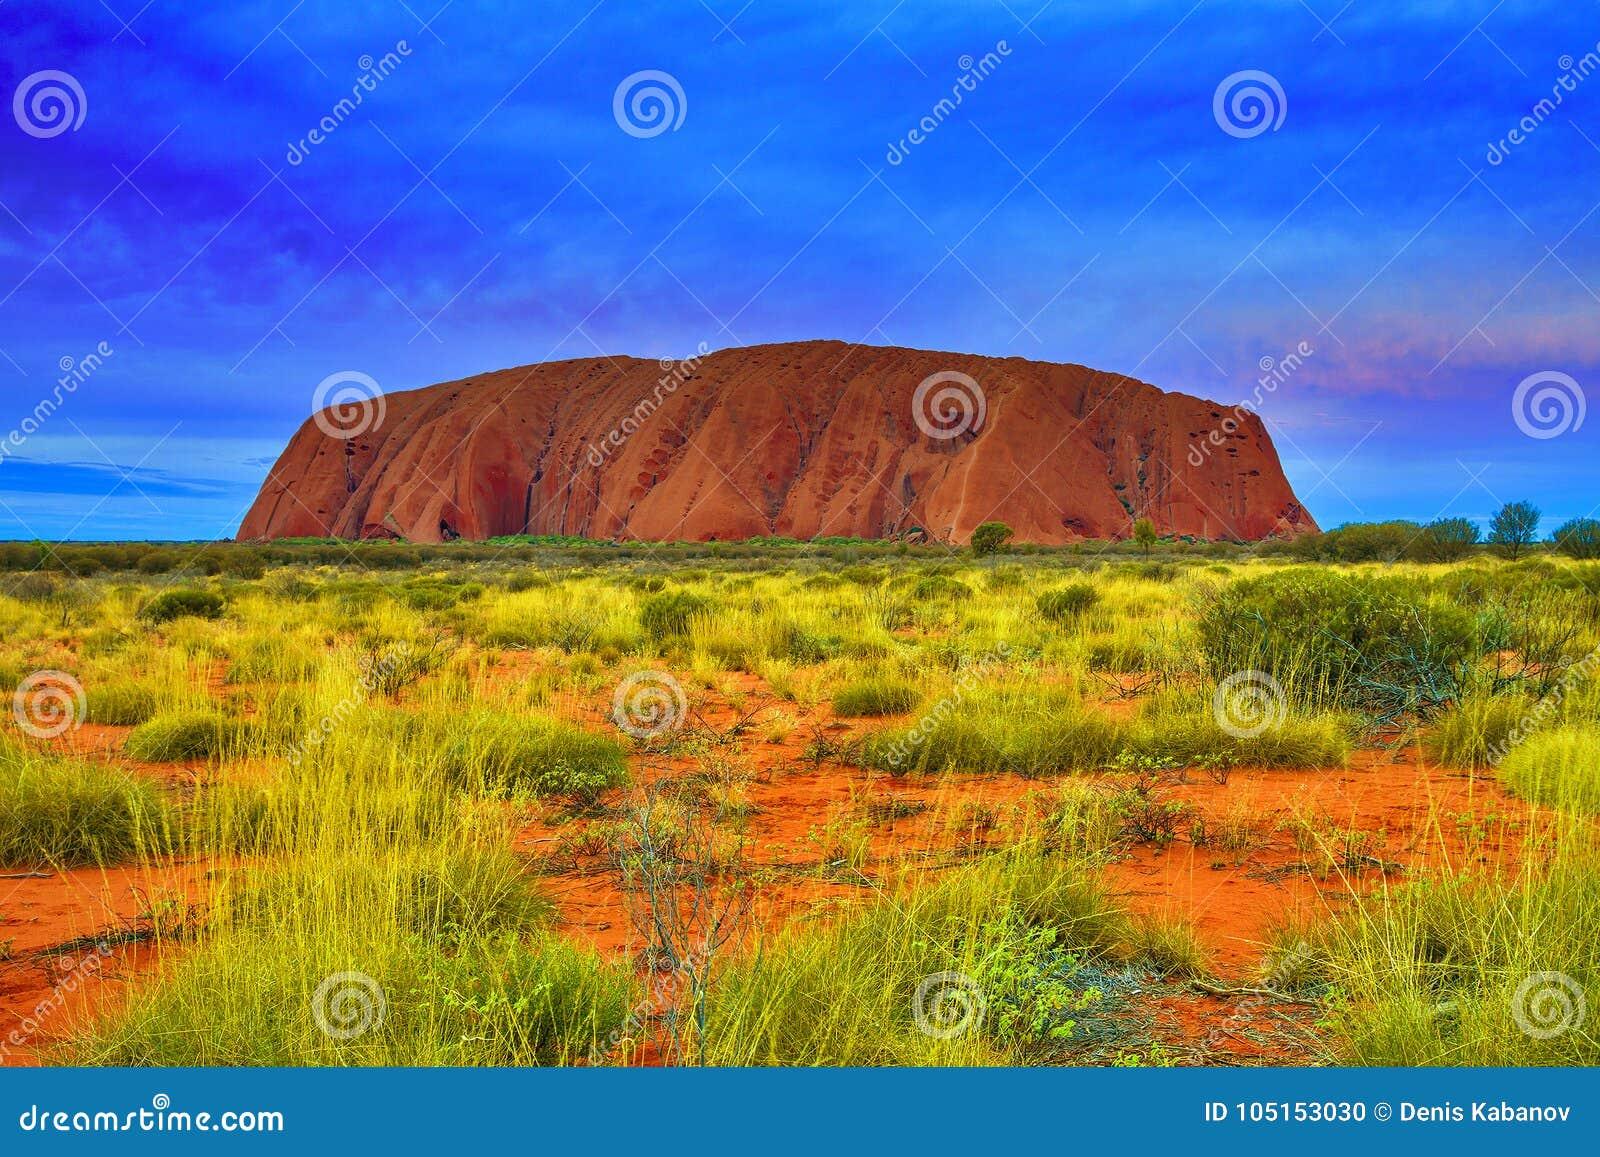 Uluru Ayers Rock red massive in Australia